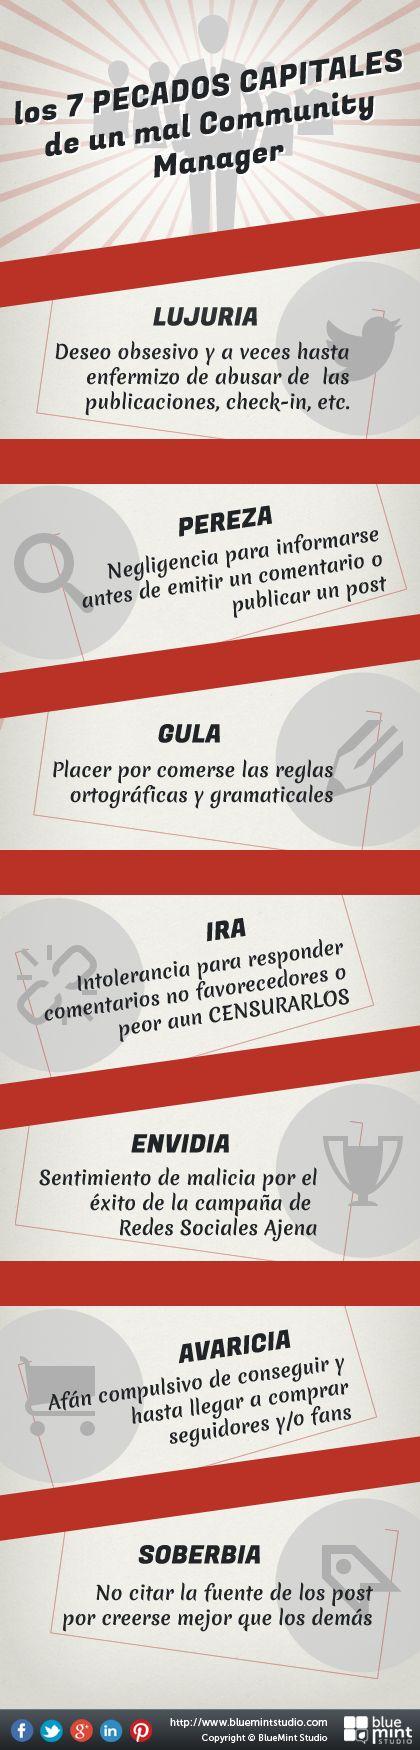 7 pecados capitales de un mal Community Manager #infografia en español.